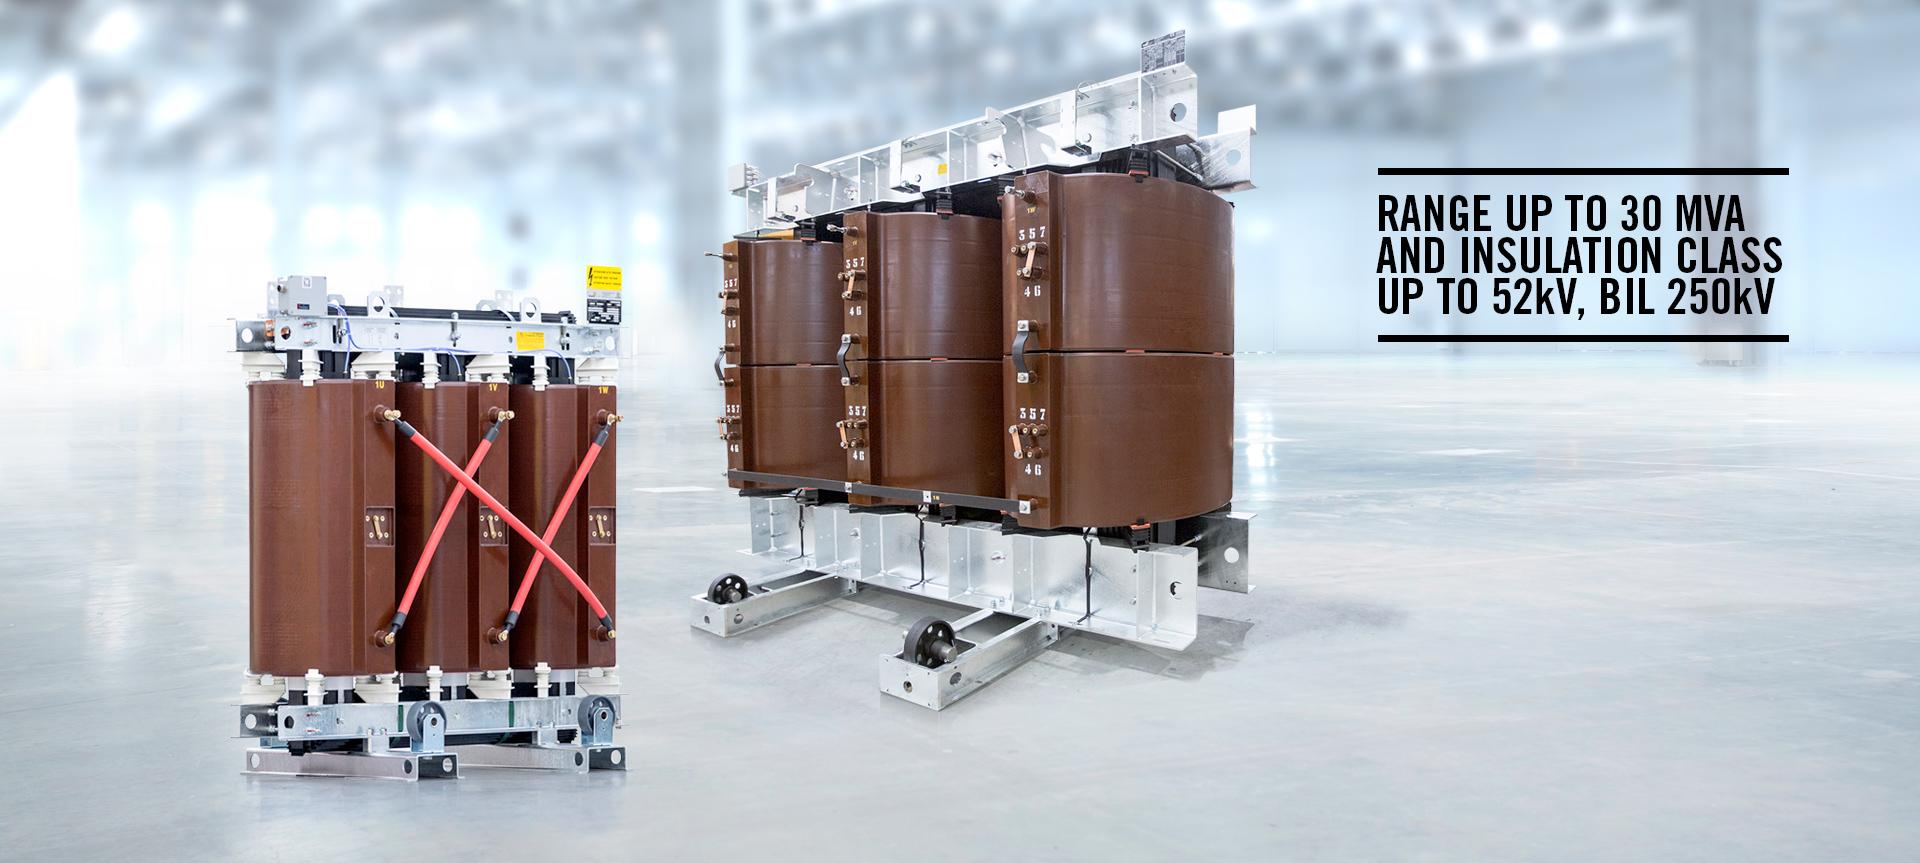 Bil test for transformers